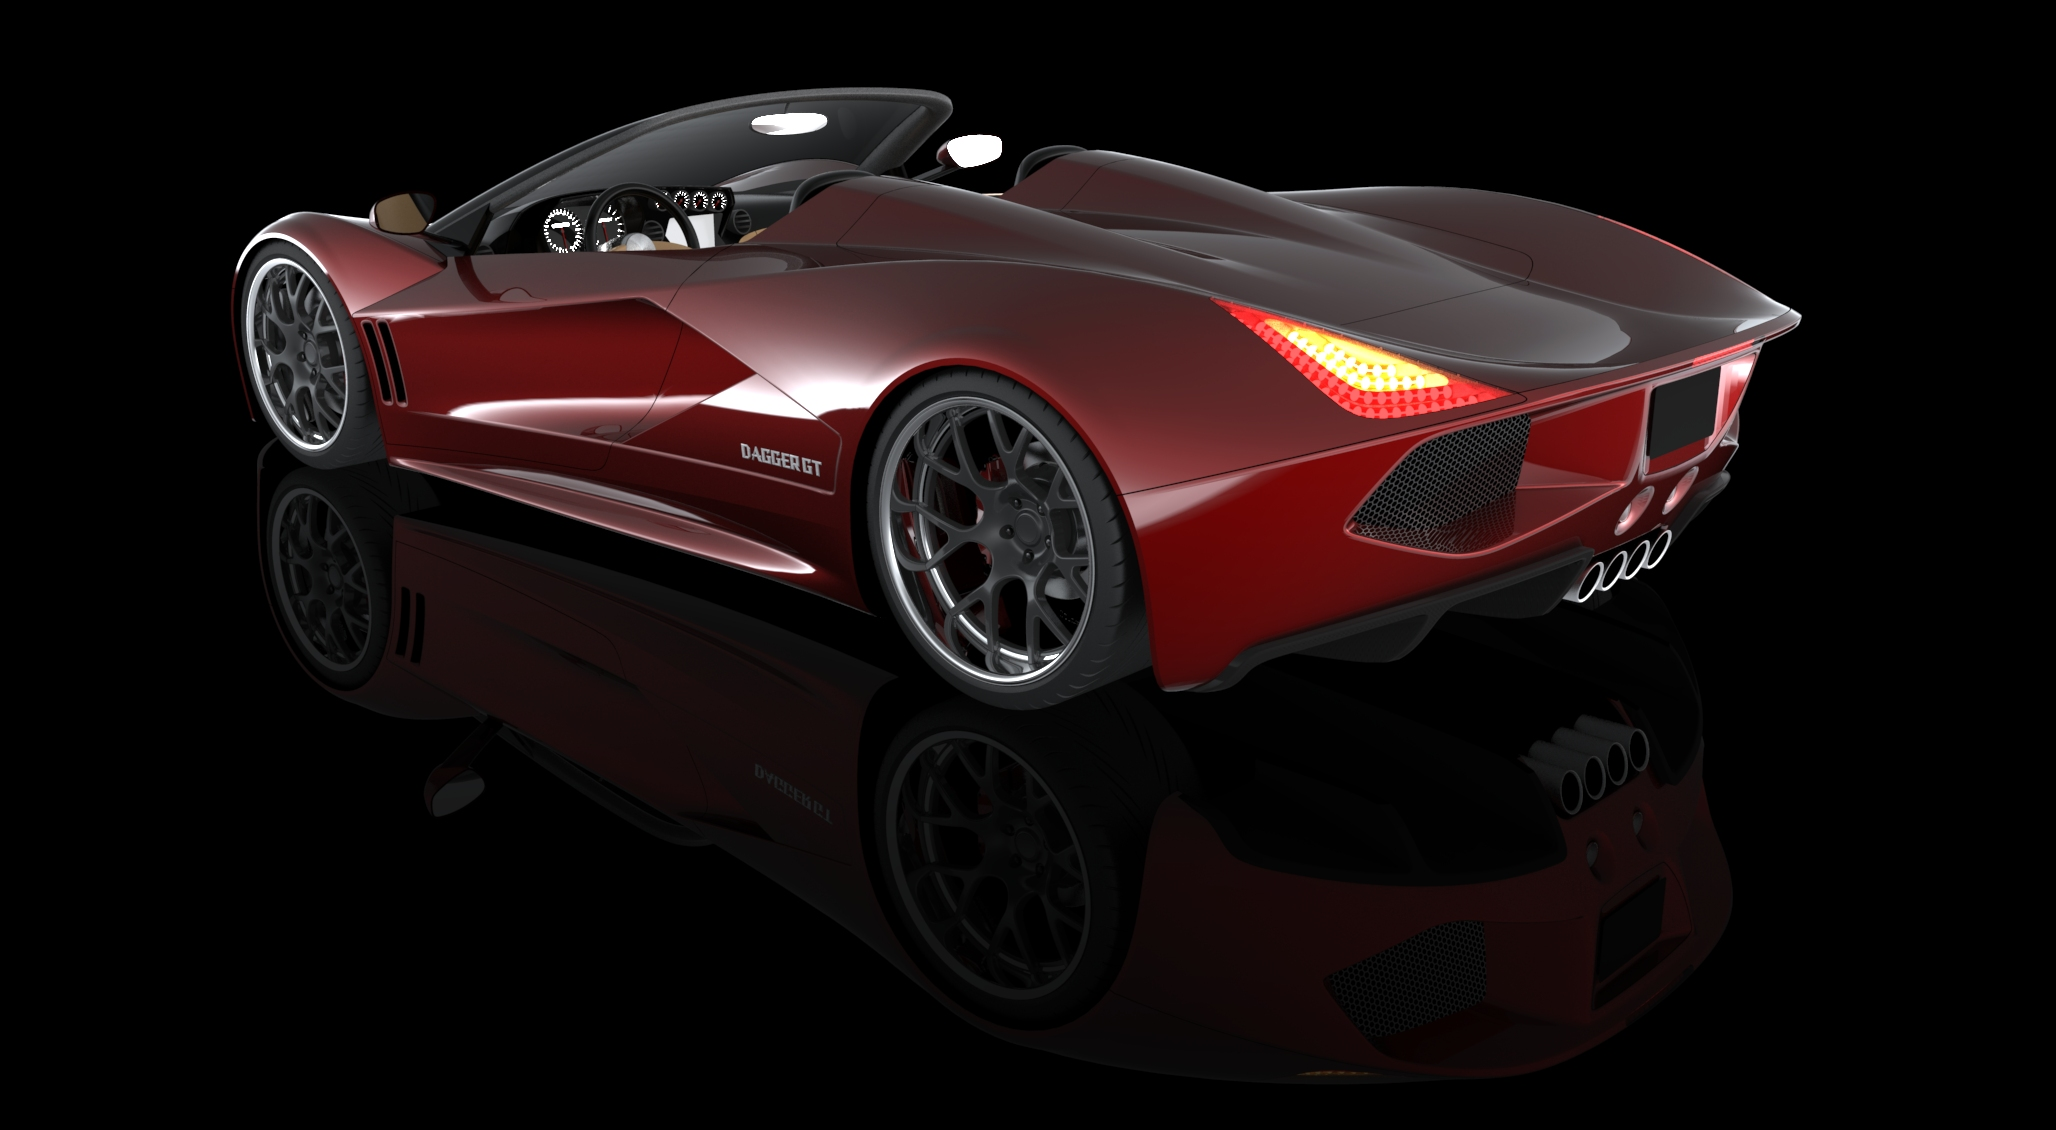 fastest car in the world transtar dagger gt. Black Bedroom Furniture Sets. Home Design Ideas